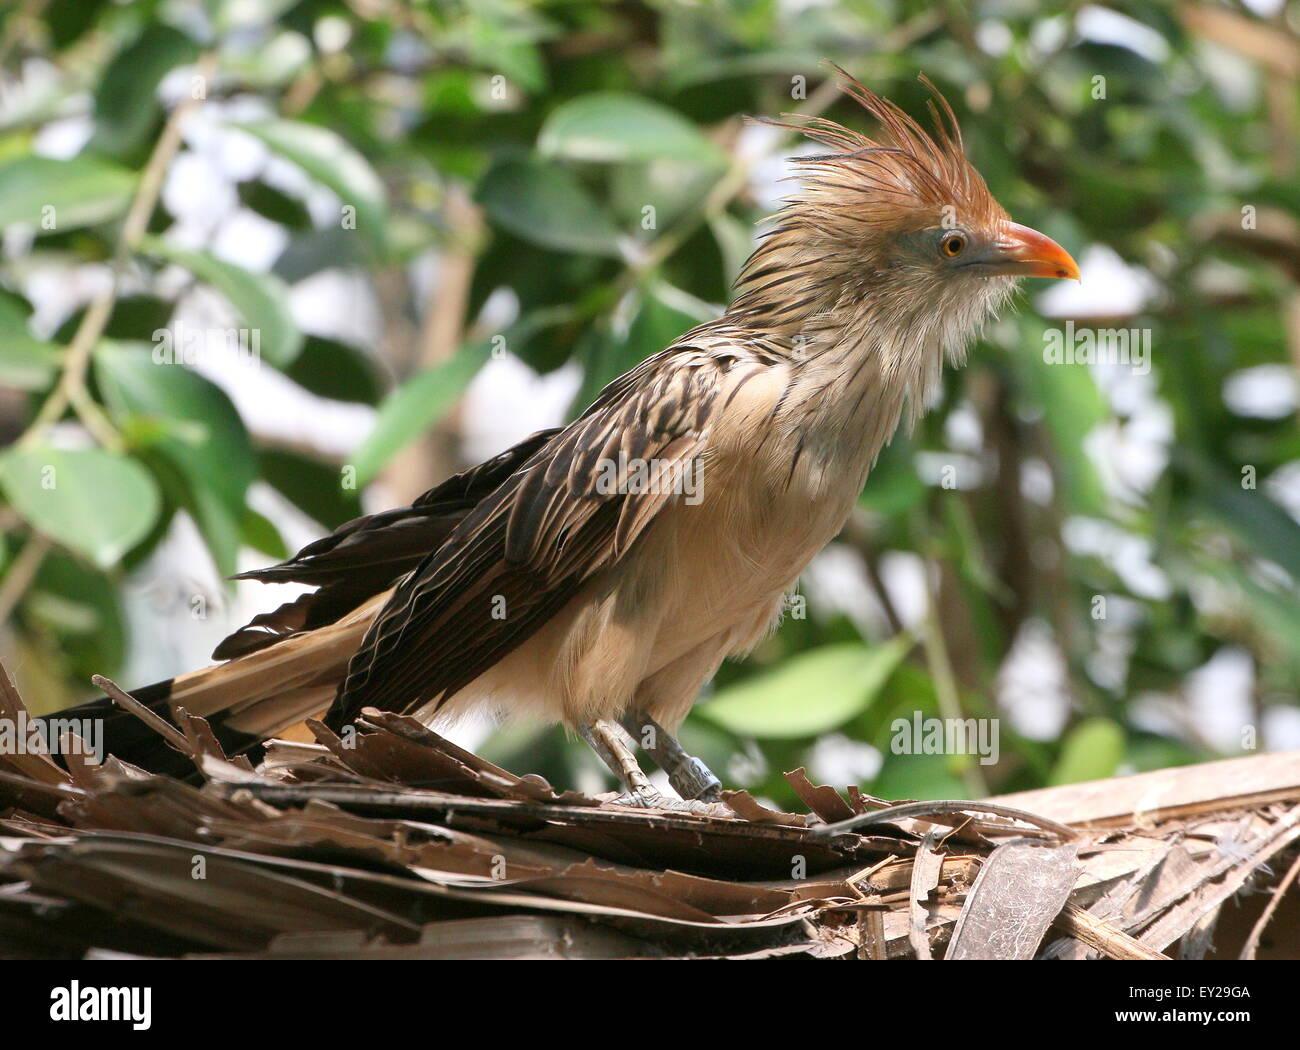 South American Guira cuckoo (Guira guira) posing on a roof, seen in profile - Stock Image